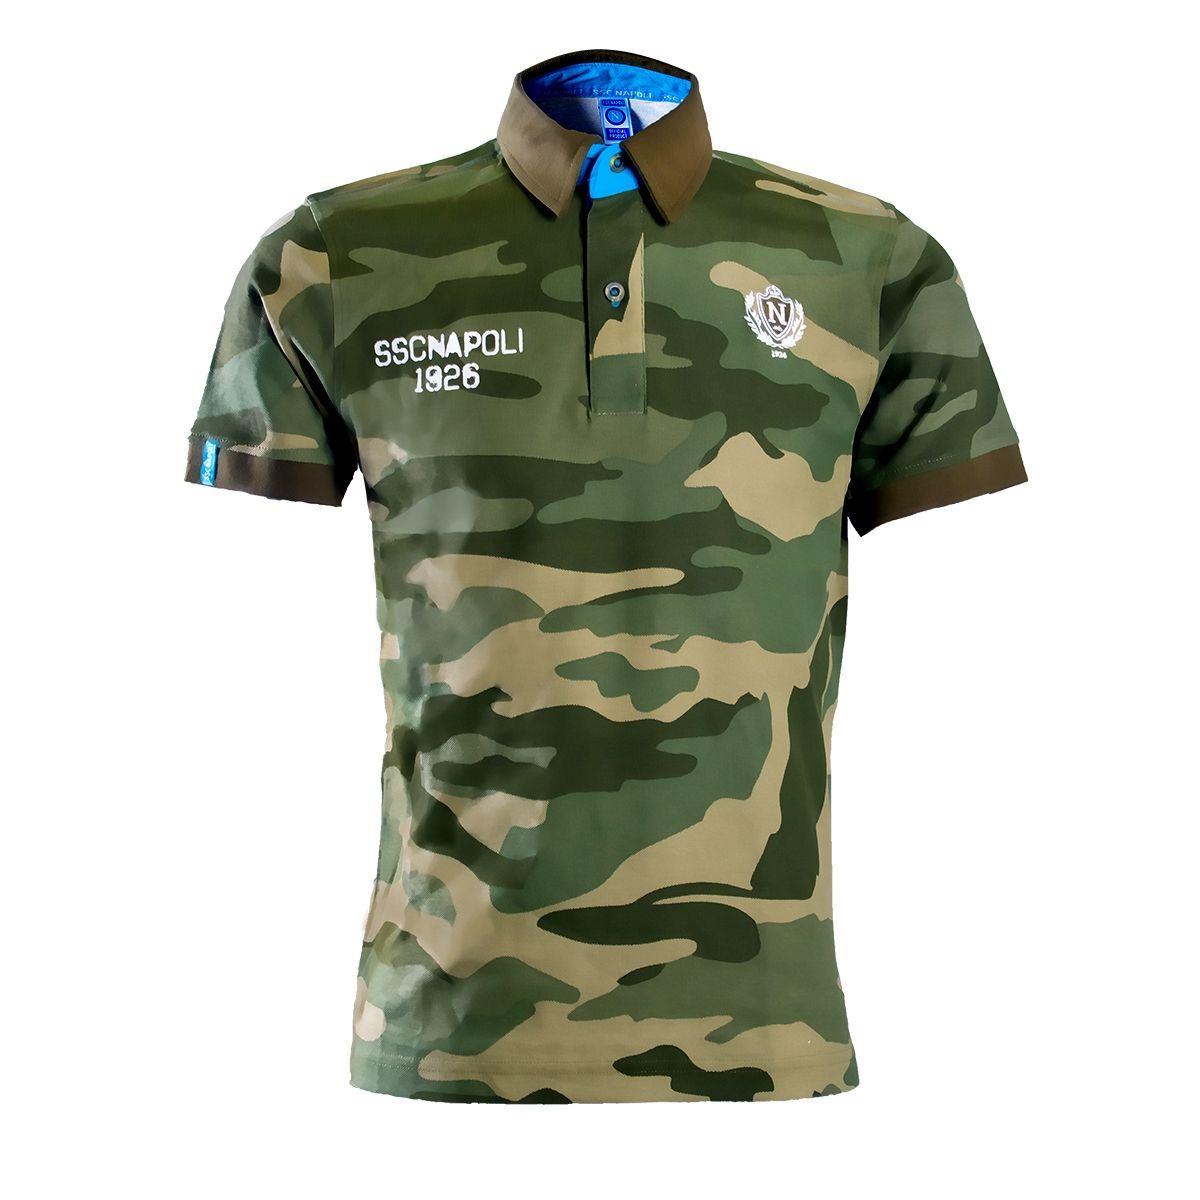 78955c738c804 SSC Napoli Web Store - Calcio Napoli - Kit gara